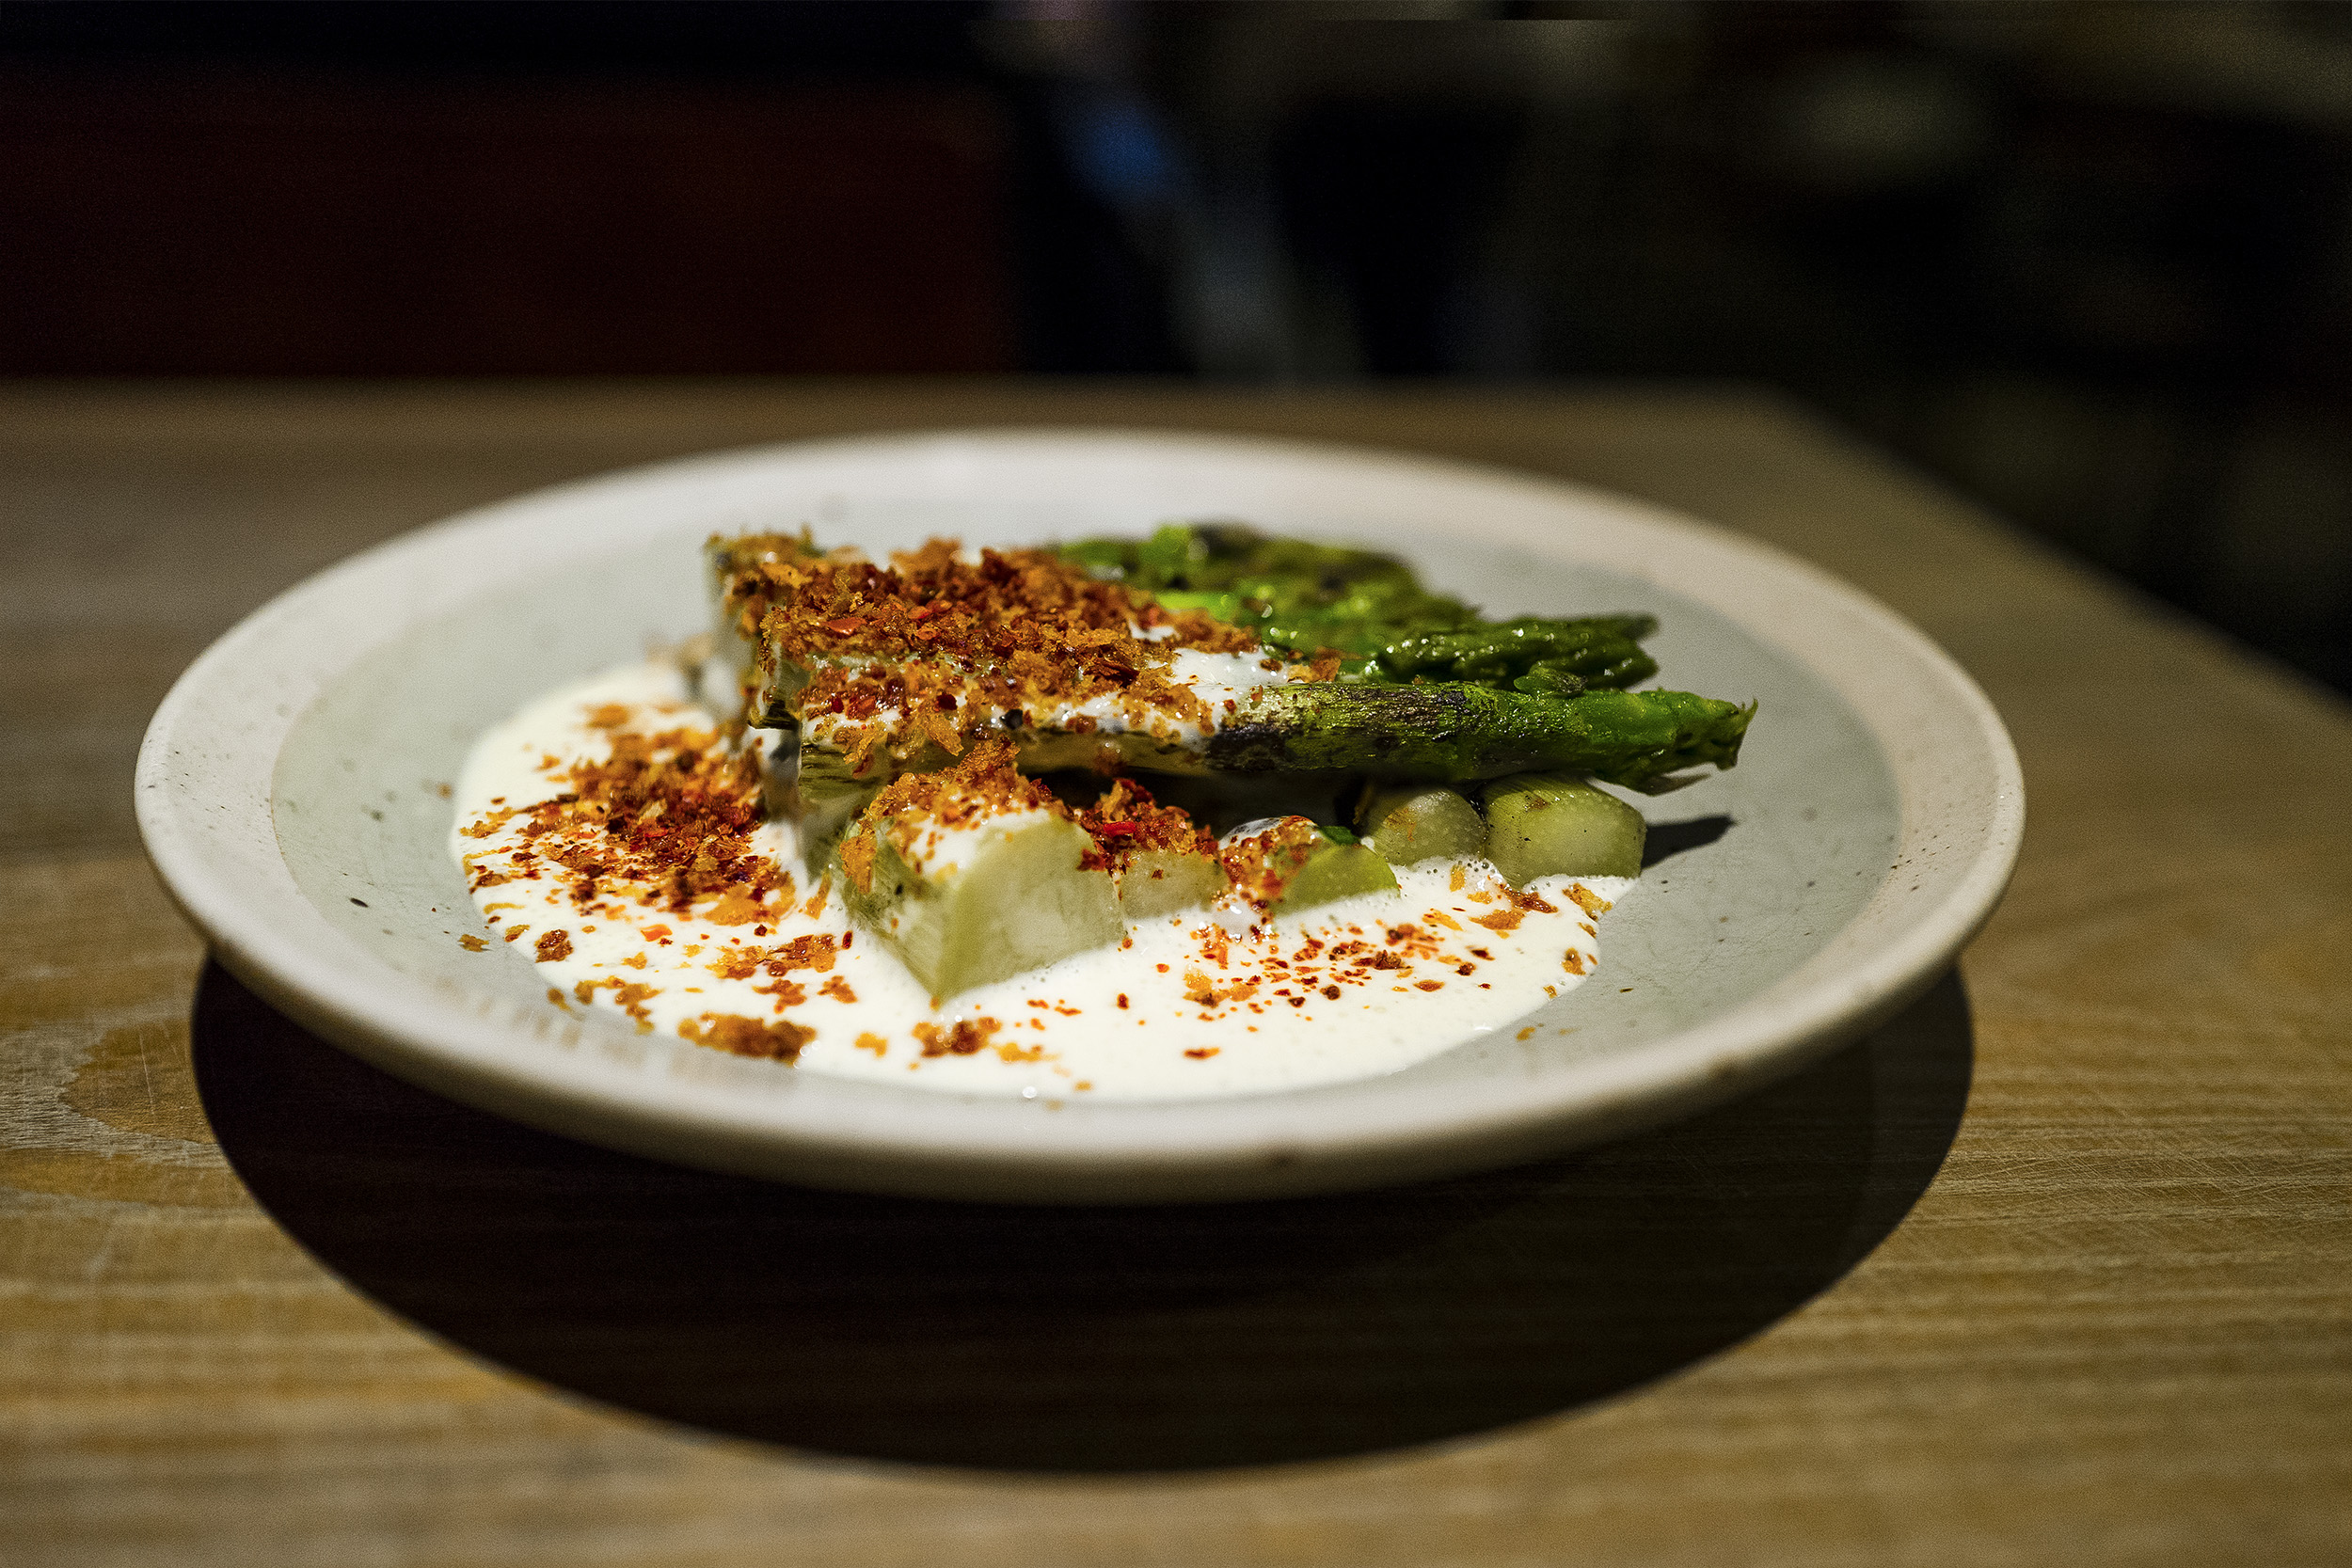 Asparagus, Egg Yolk, Black Sesame, Aleppo Pepper